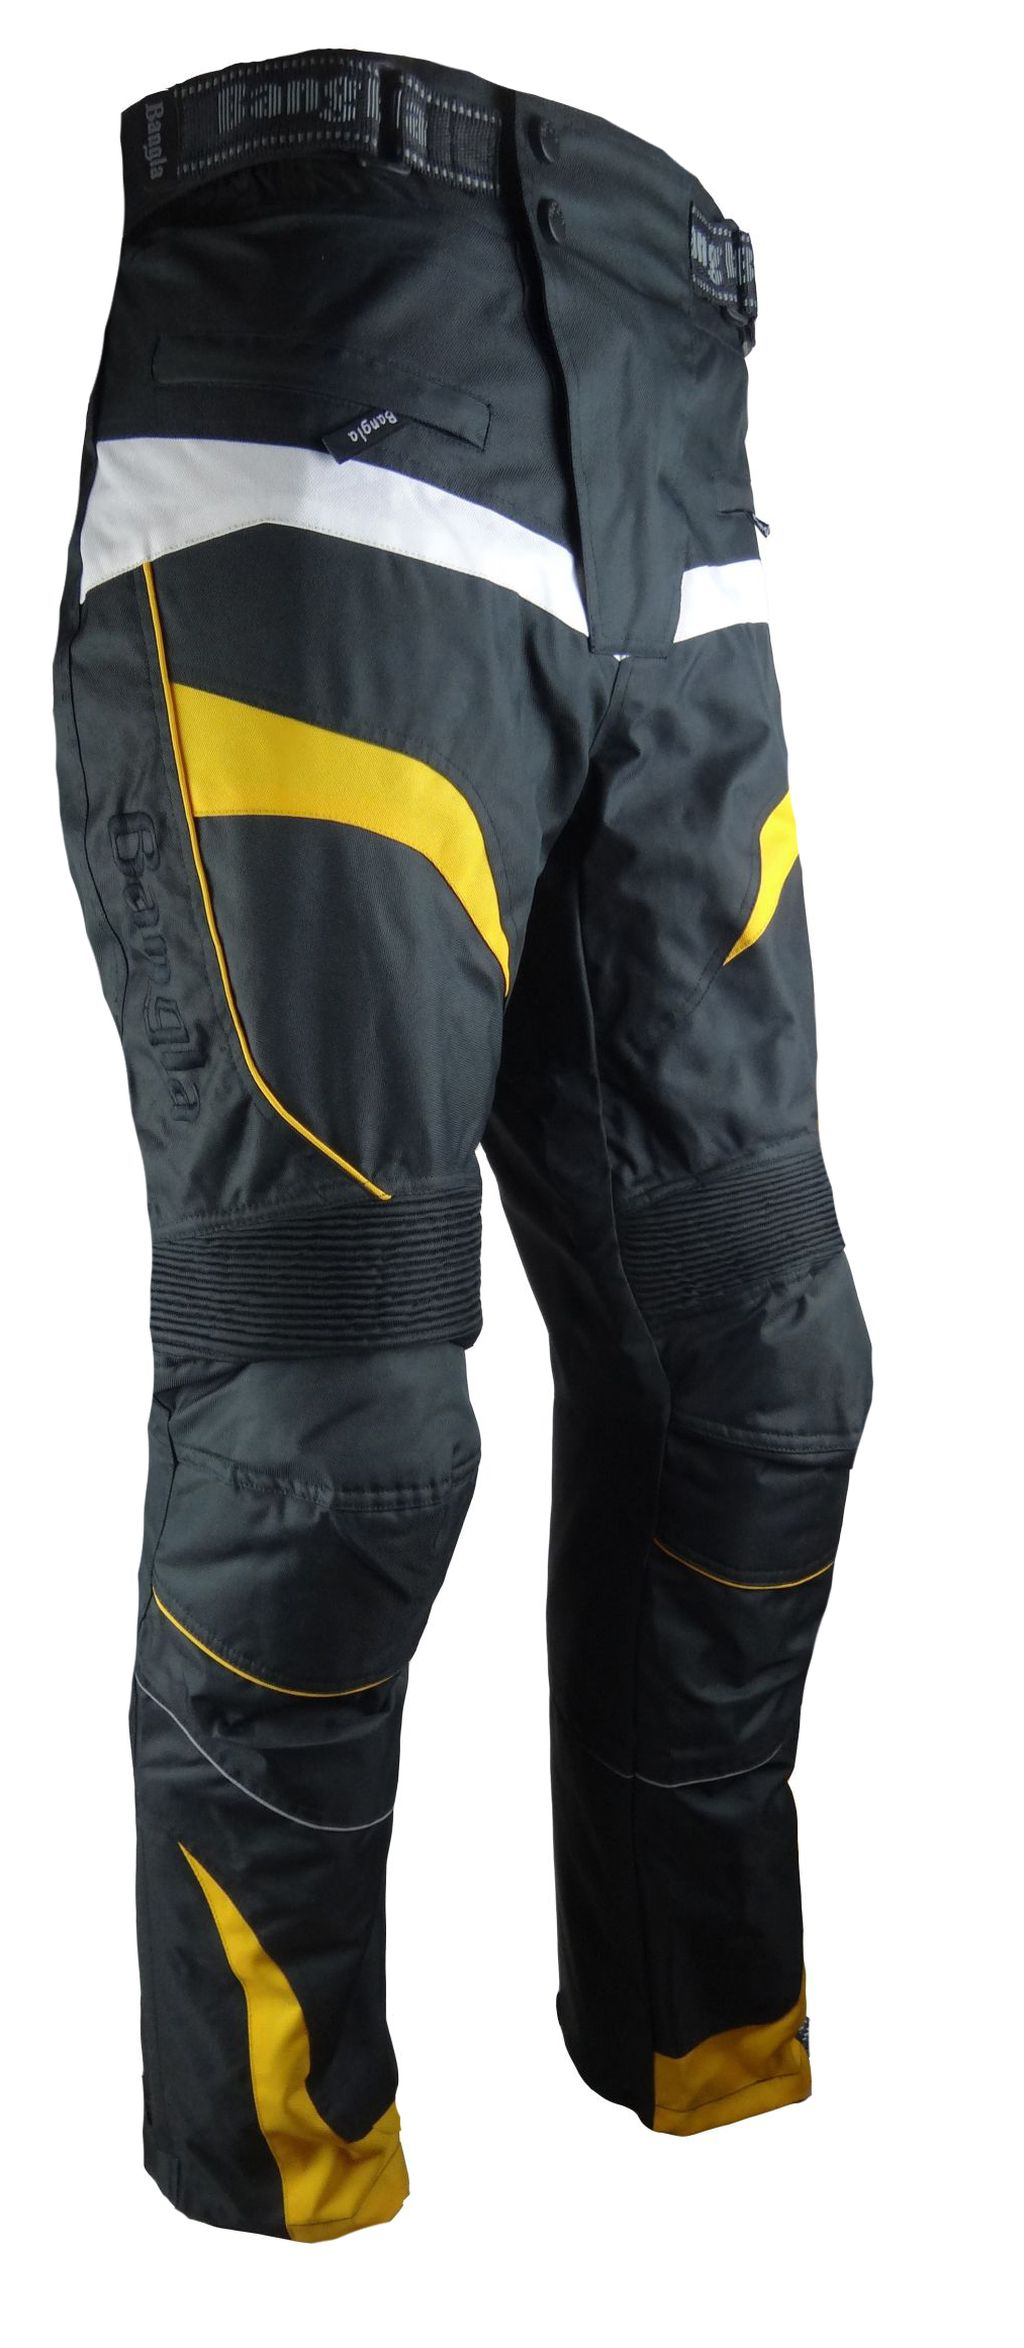 Bangla Motorrad Hose Motorradhose Textil  Cordura schwarz gelb S M L- 6XL